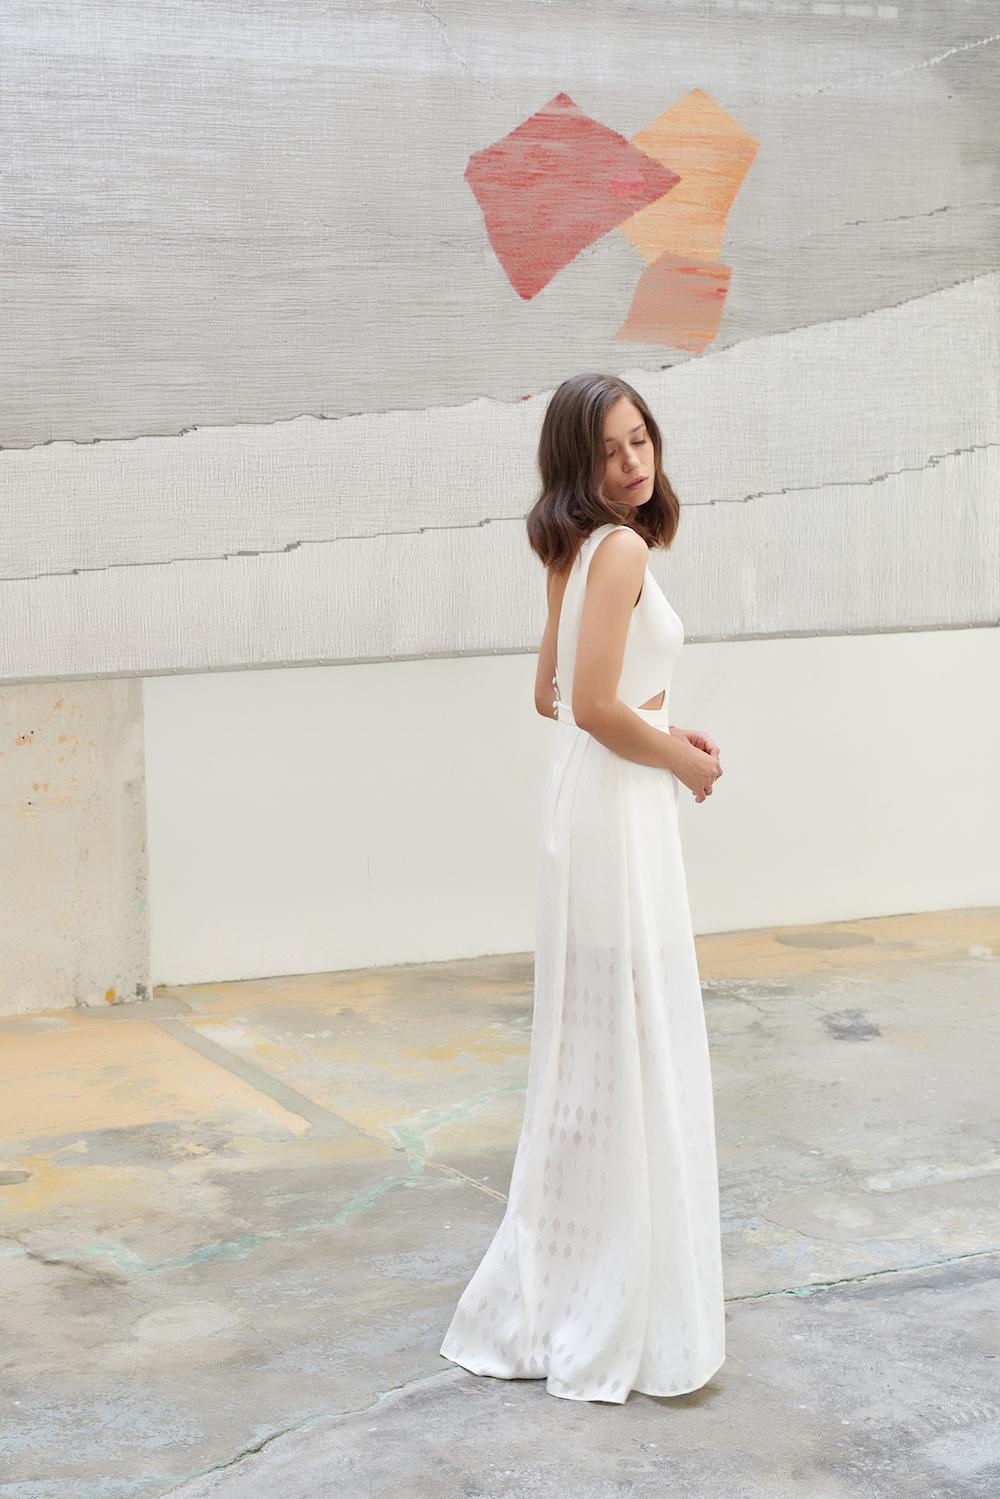 parisian-inspired-blog-mariagecamille-marguet-robe-mariée-paris-collection18-colin-orpheeg3-LD.jpg